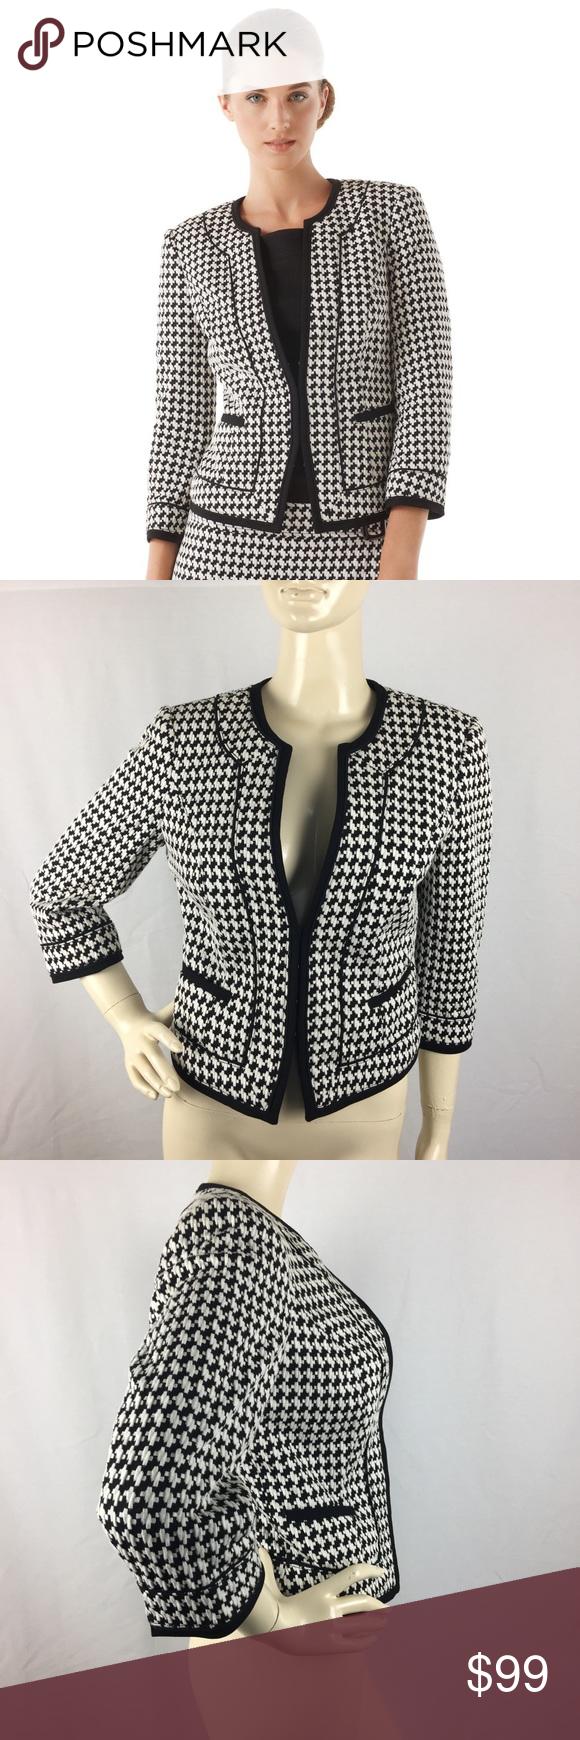 57768f030 White House Black Market Houndstooth Knit Blazer 6 New without tags. White  House Black Market Jackets   Coats Blazers